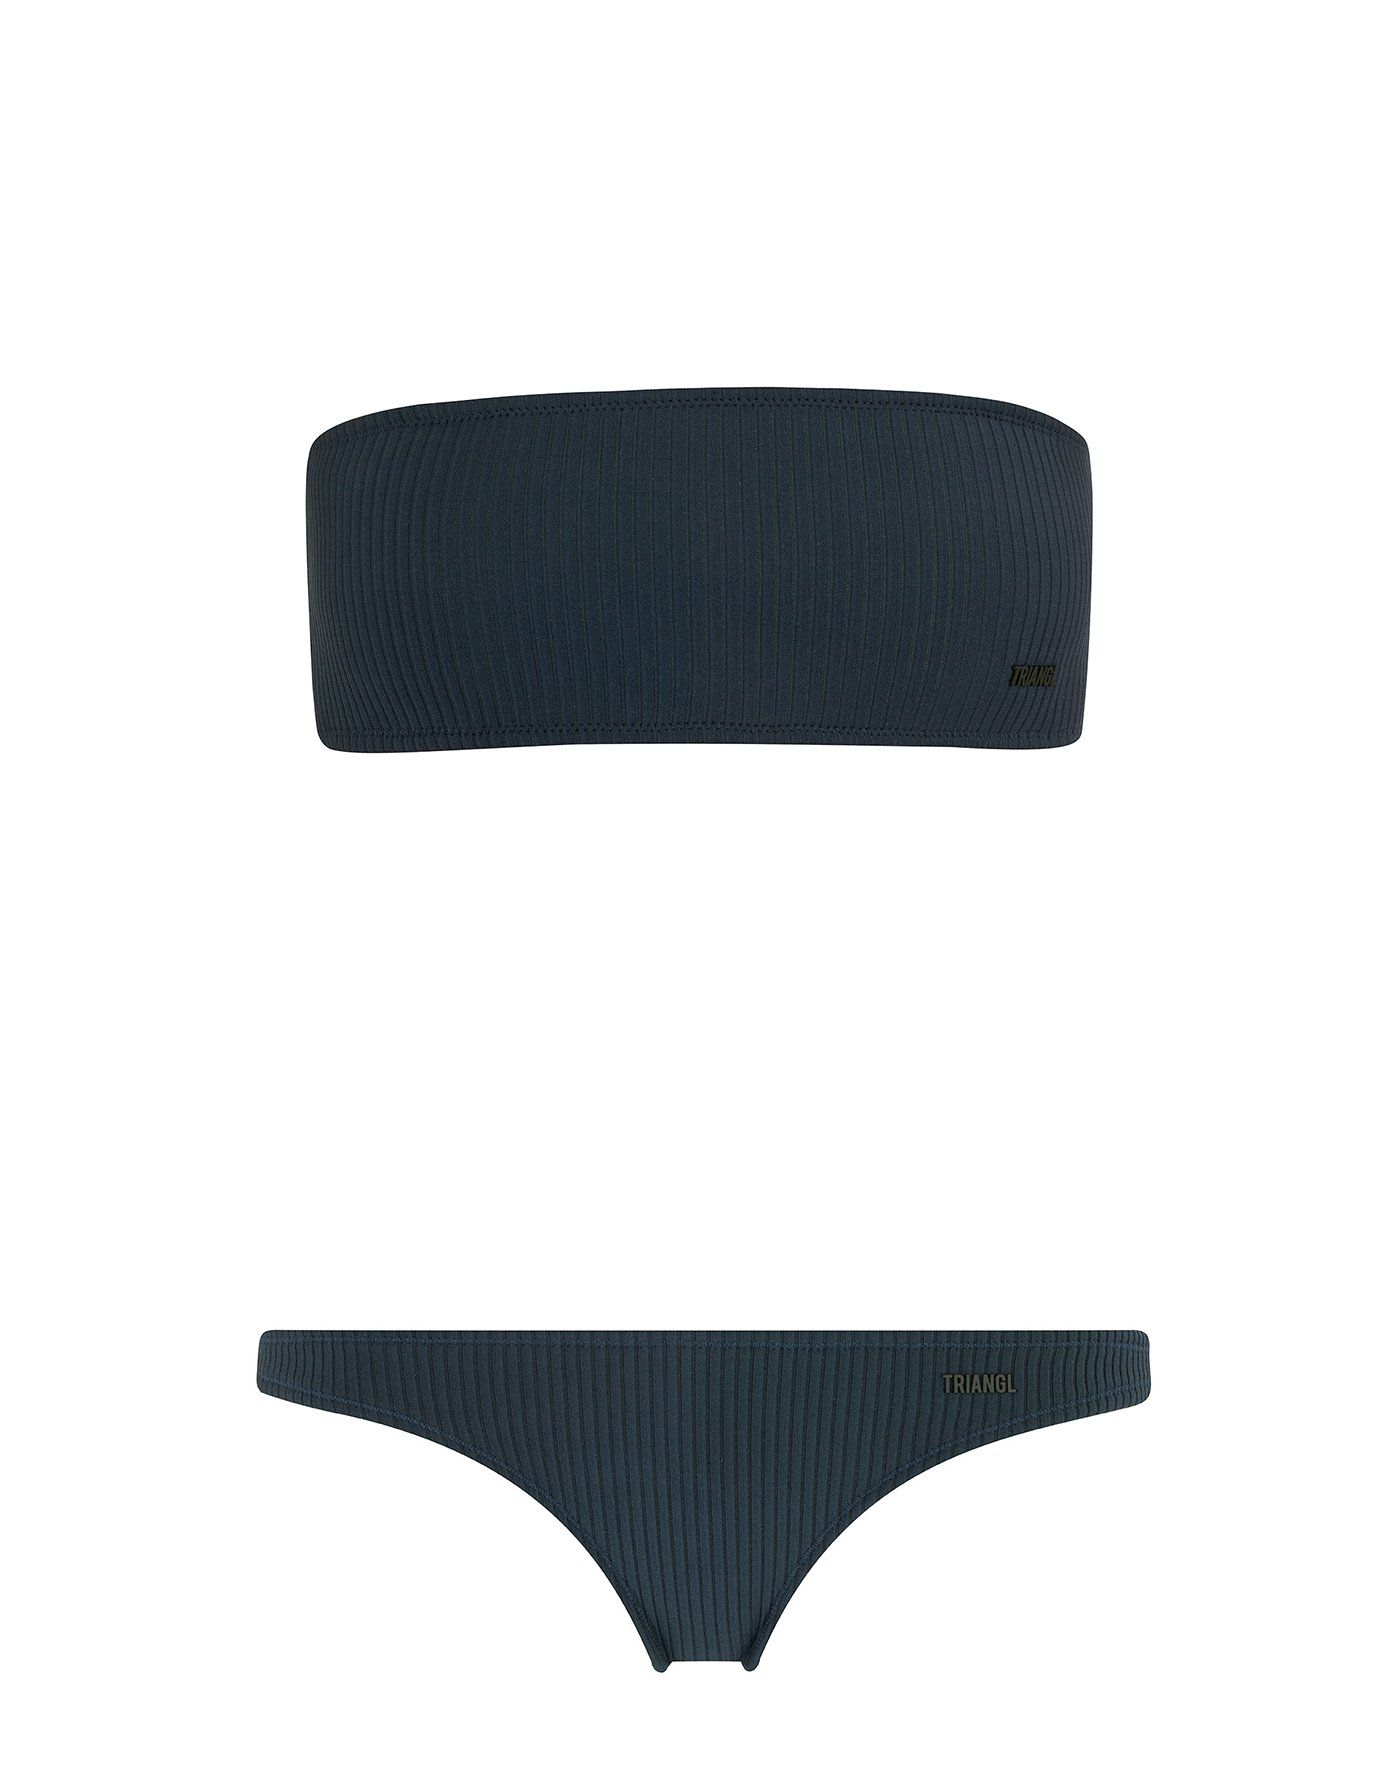 5e77938a633c8 Inc - top in 2019 | Fashion | Strapless swimsuit, Bikinis, Bandeau ...